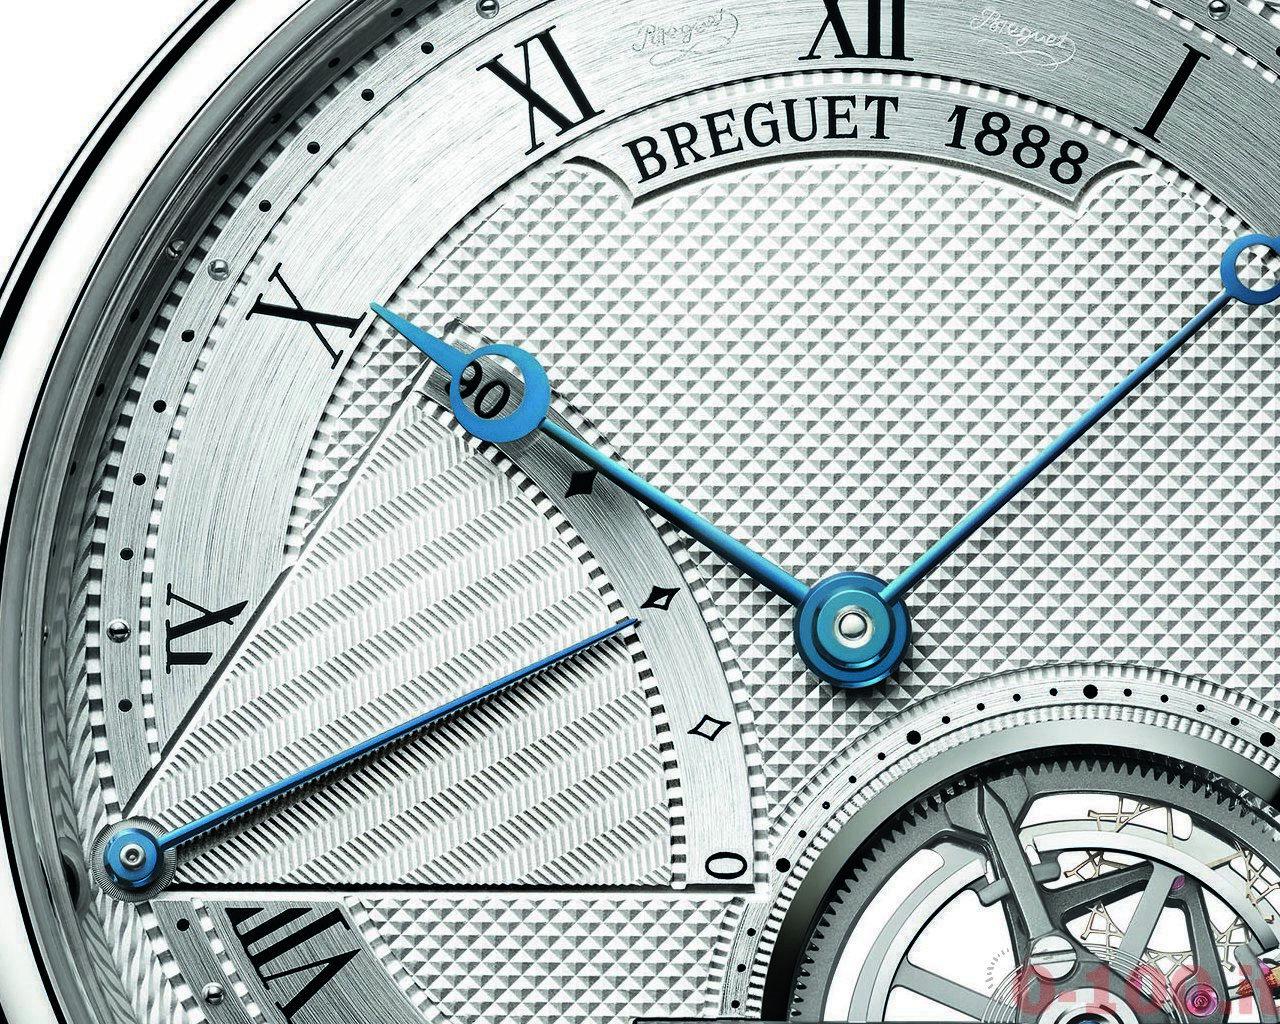 breguet-classique-grande-complication-tourbillon-extra-plat-ref-5377-baselworld-2014_0-100_11